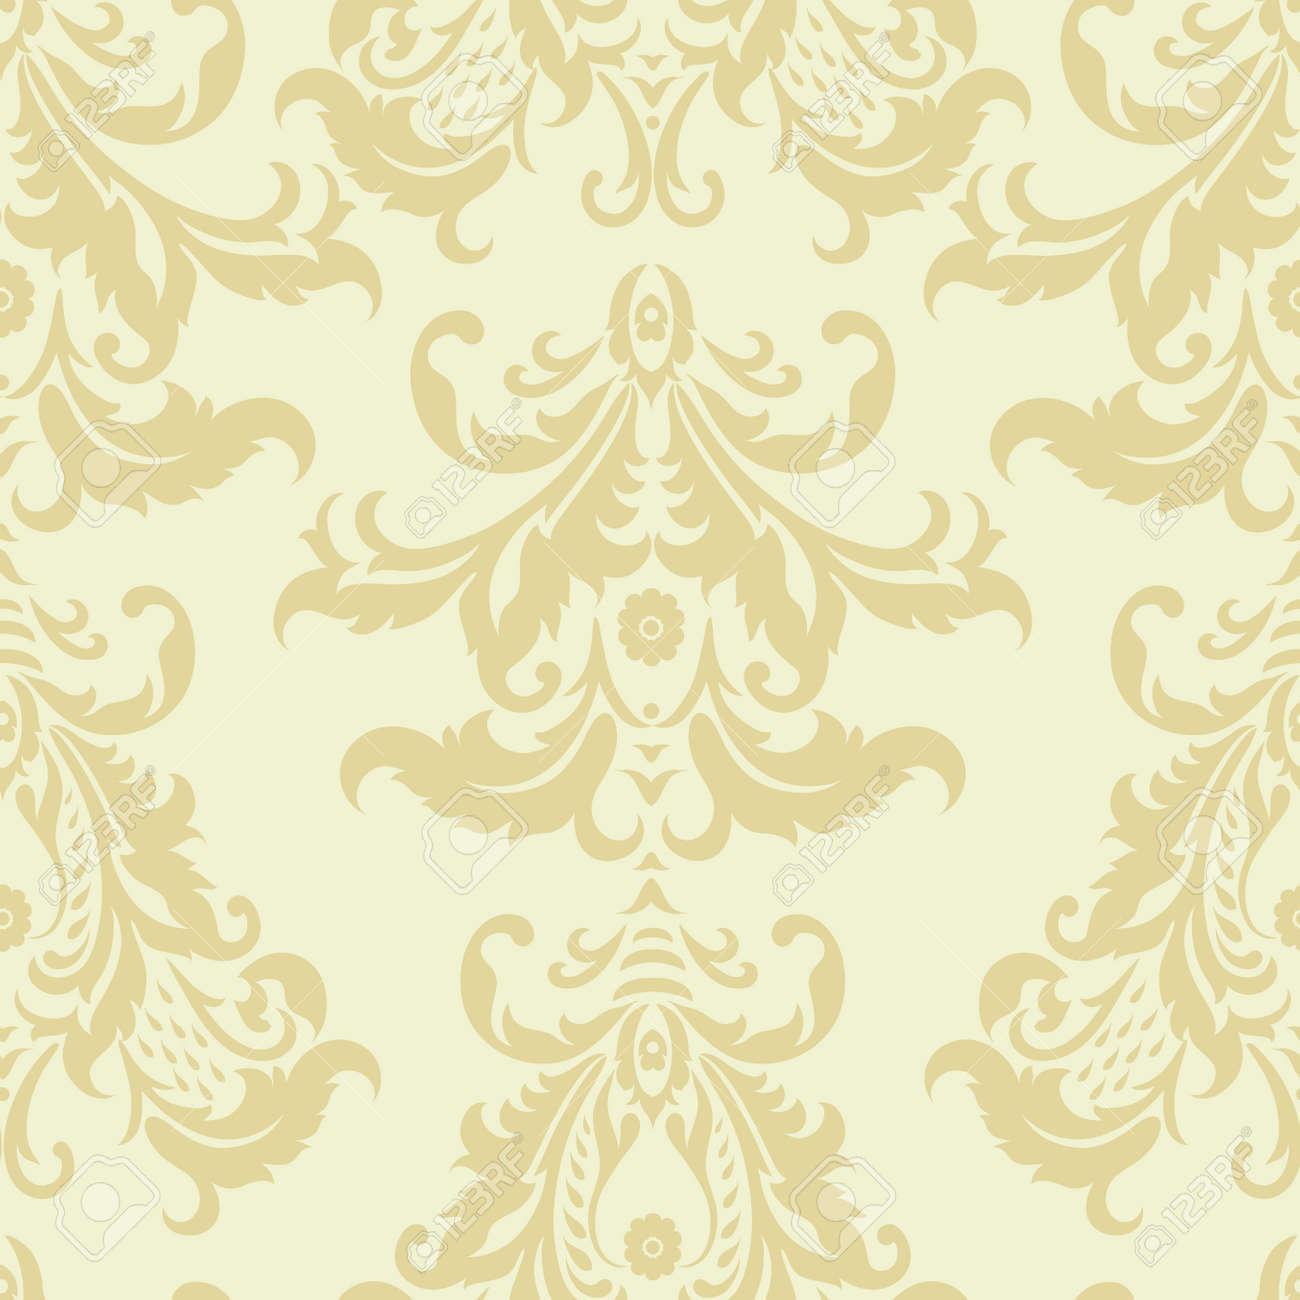 Damask Floral Wallpaper Vintage Vector Seamless Pattern Royalty